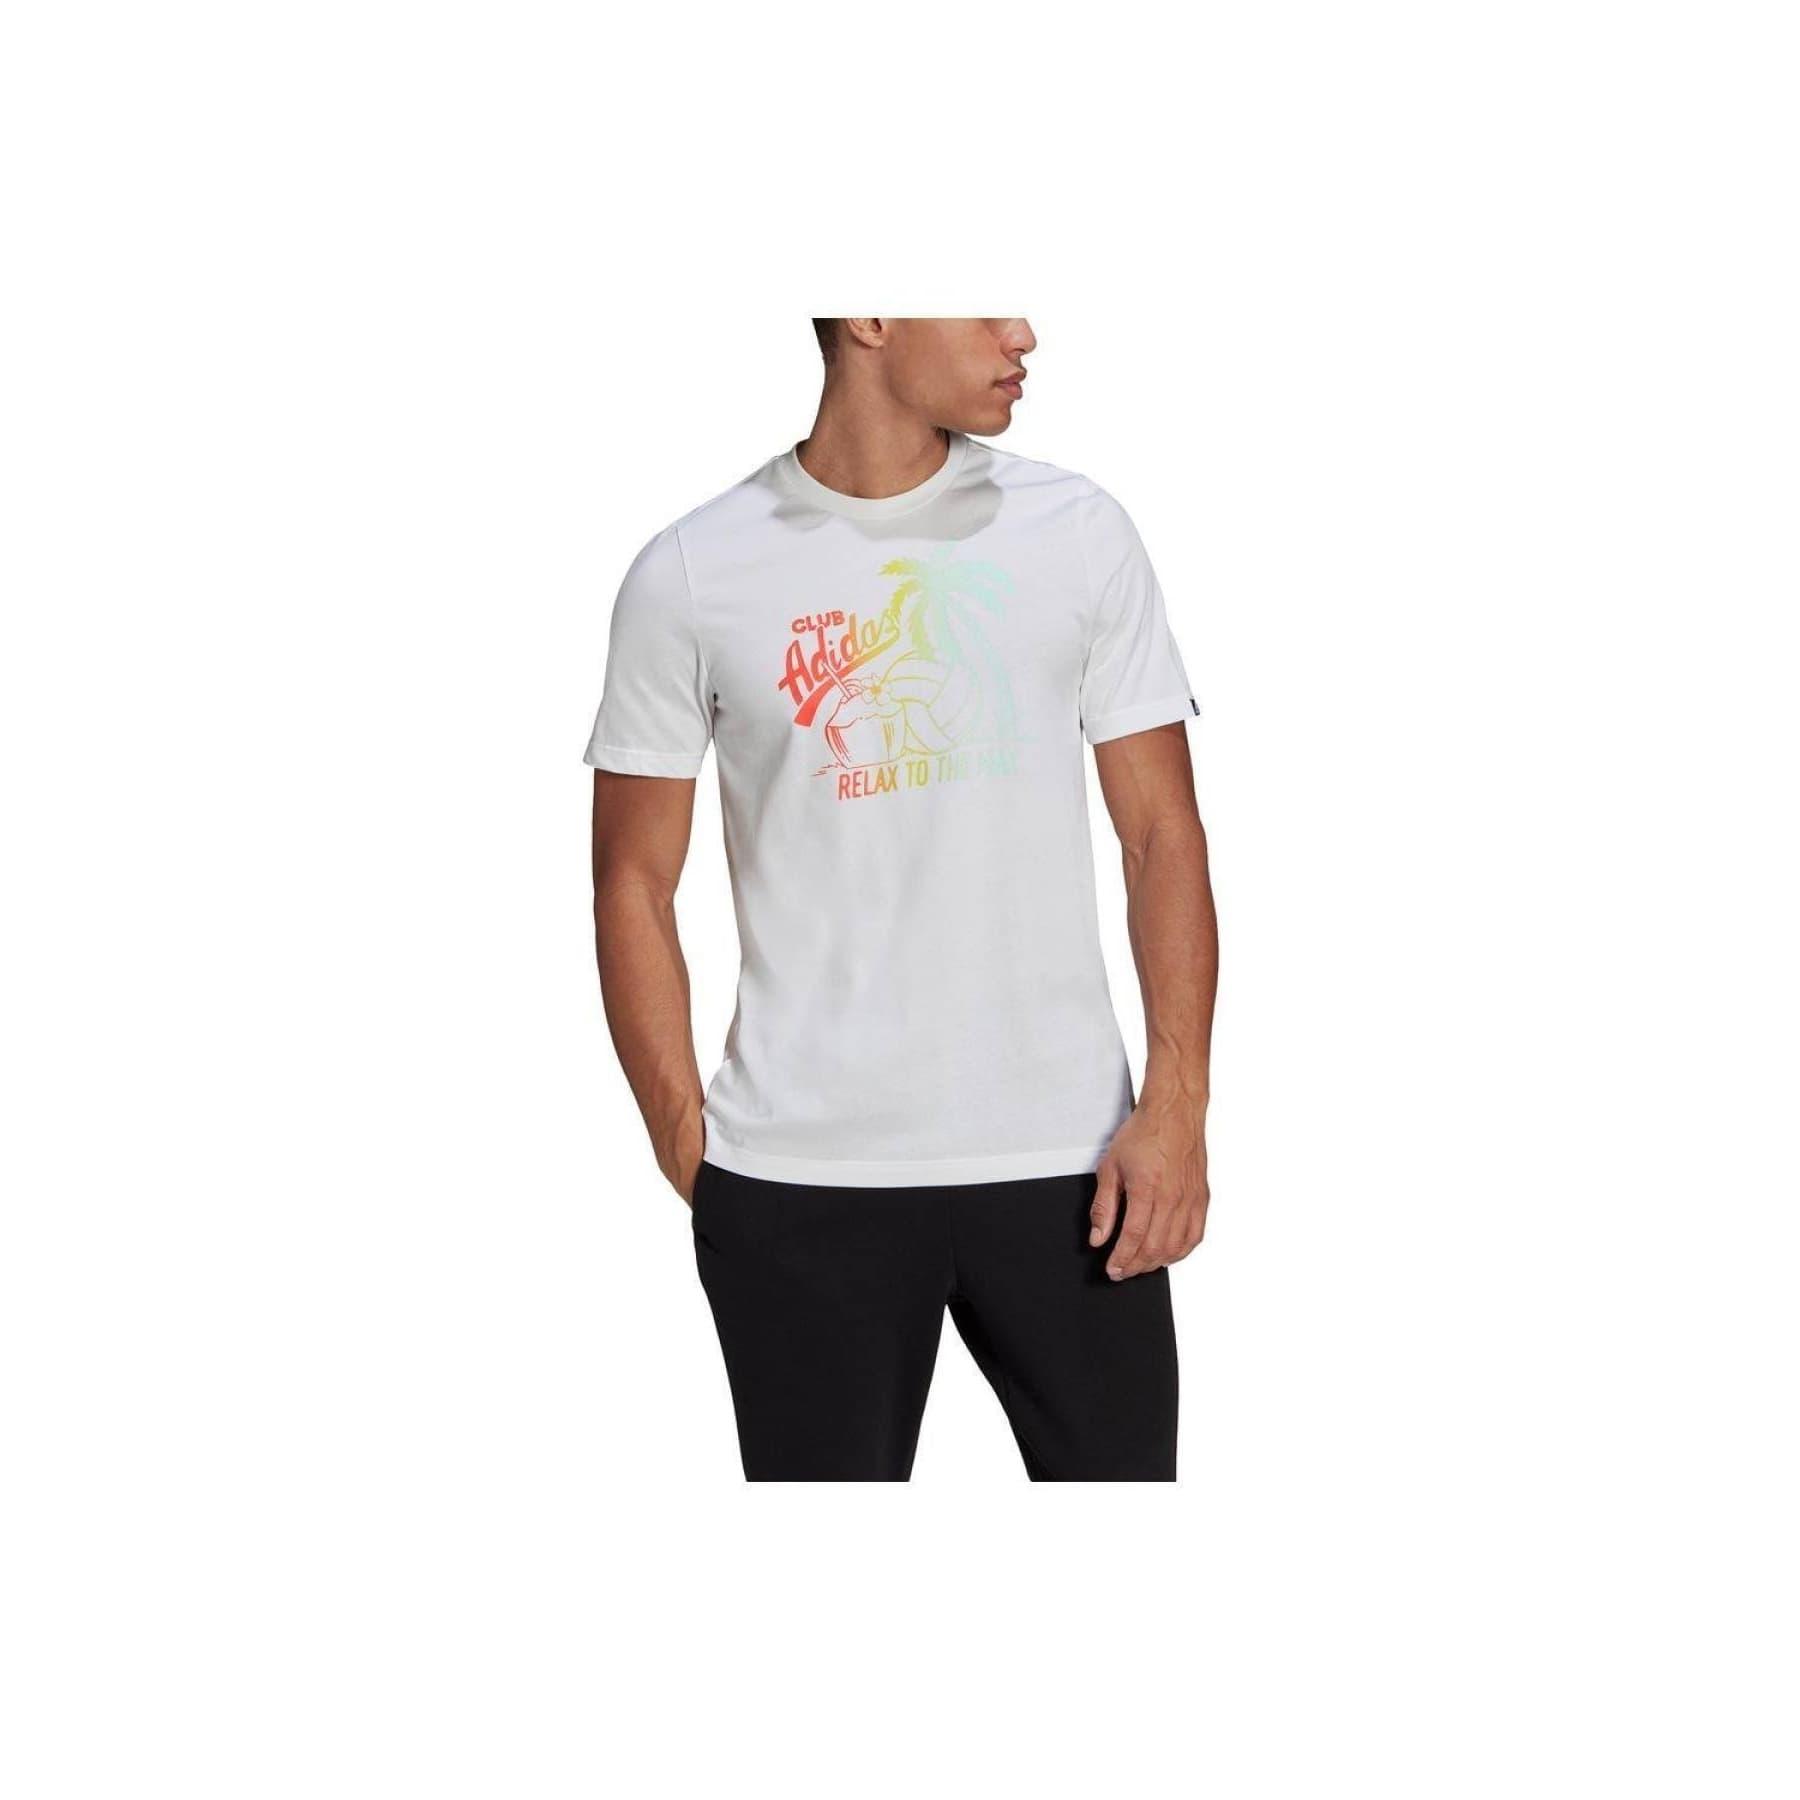 Aeroready Vacation Graphic Erkek Beyaz Tişört (GL3250)